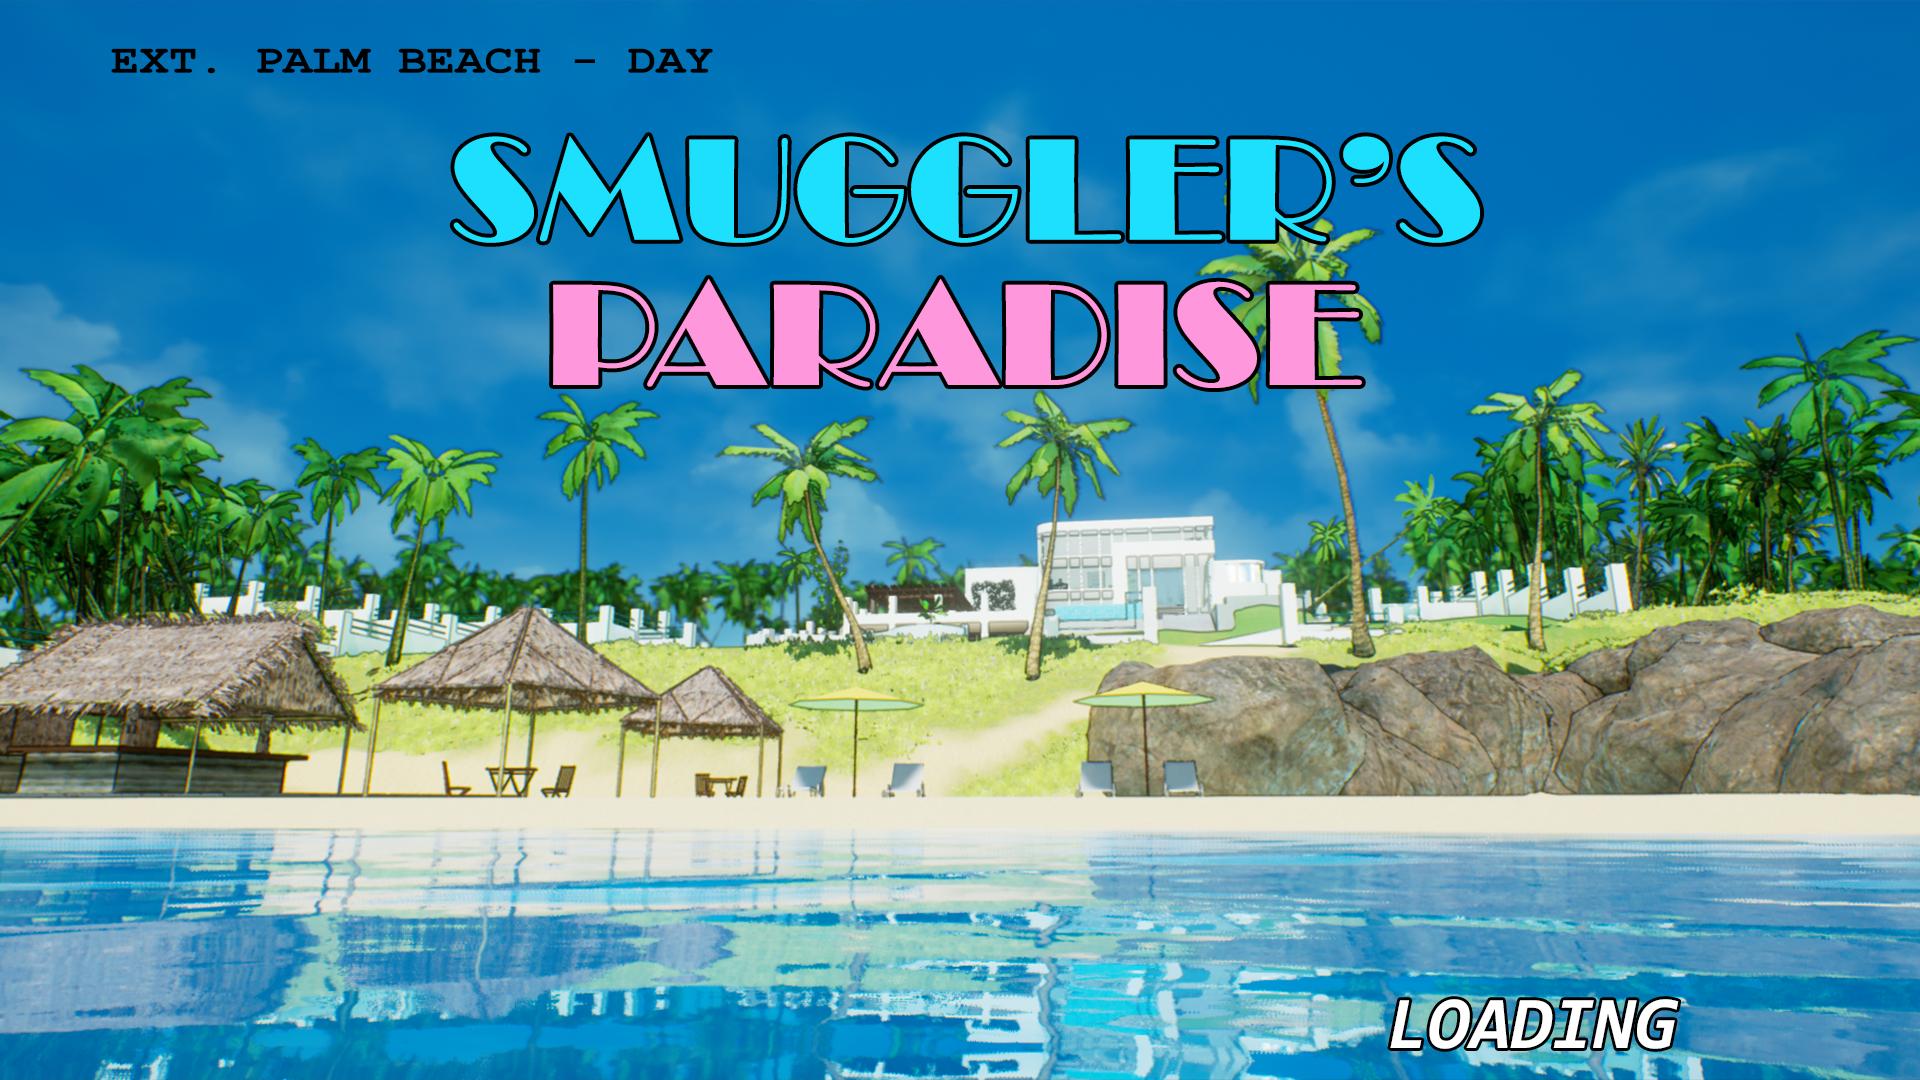 SmugglersParadise_Splash